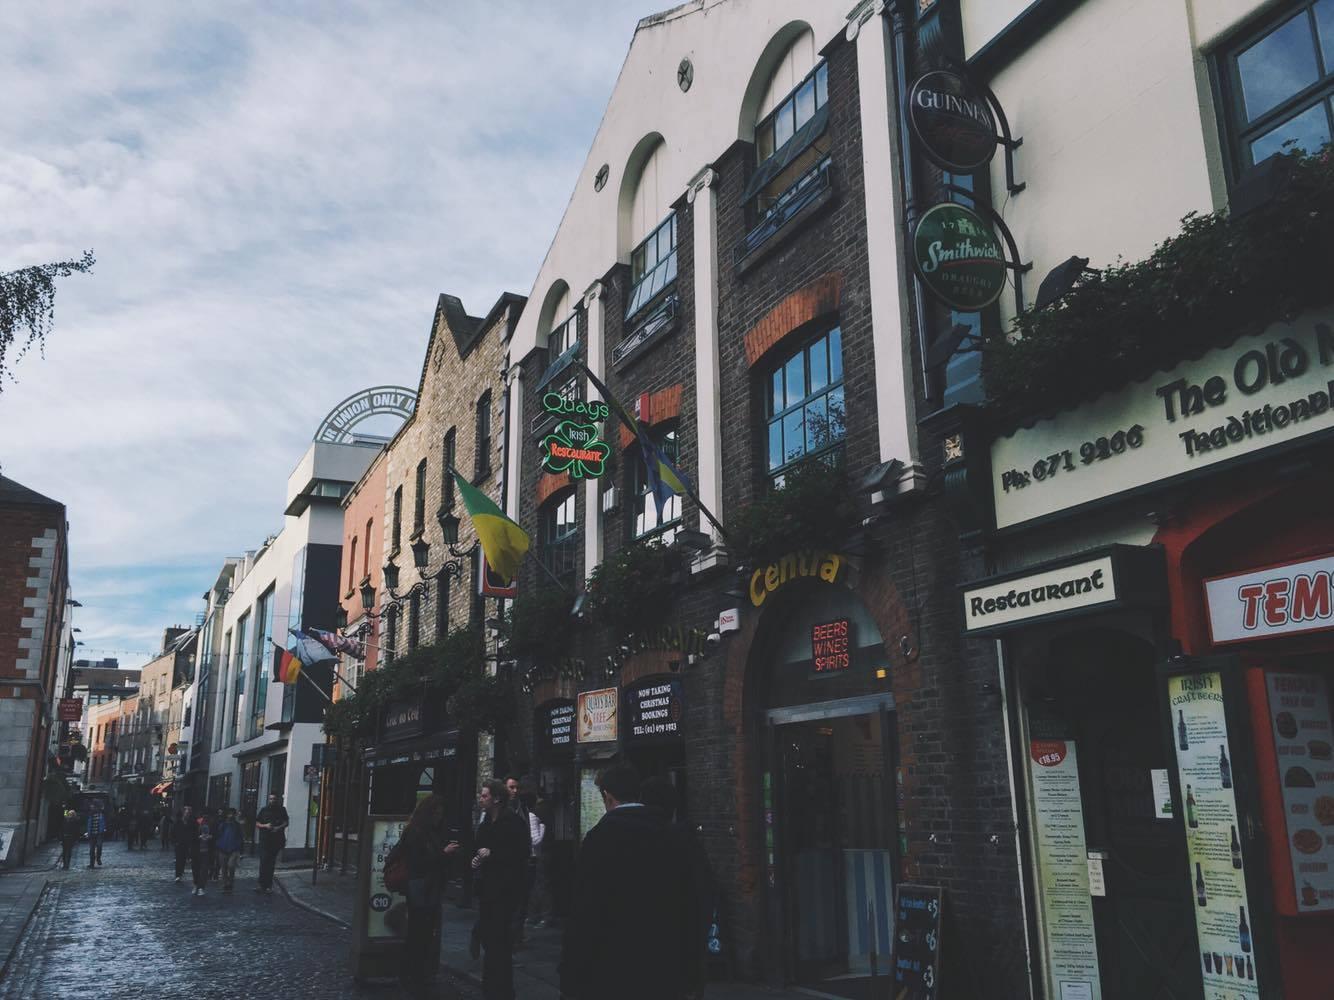 Dublin Annina Berweger